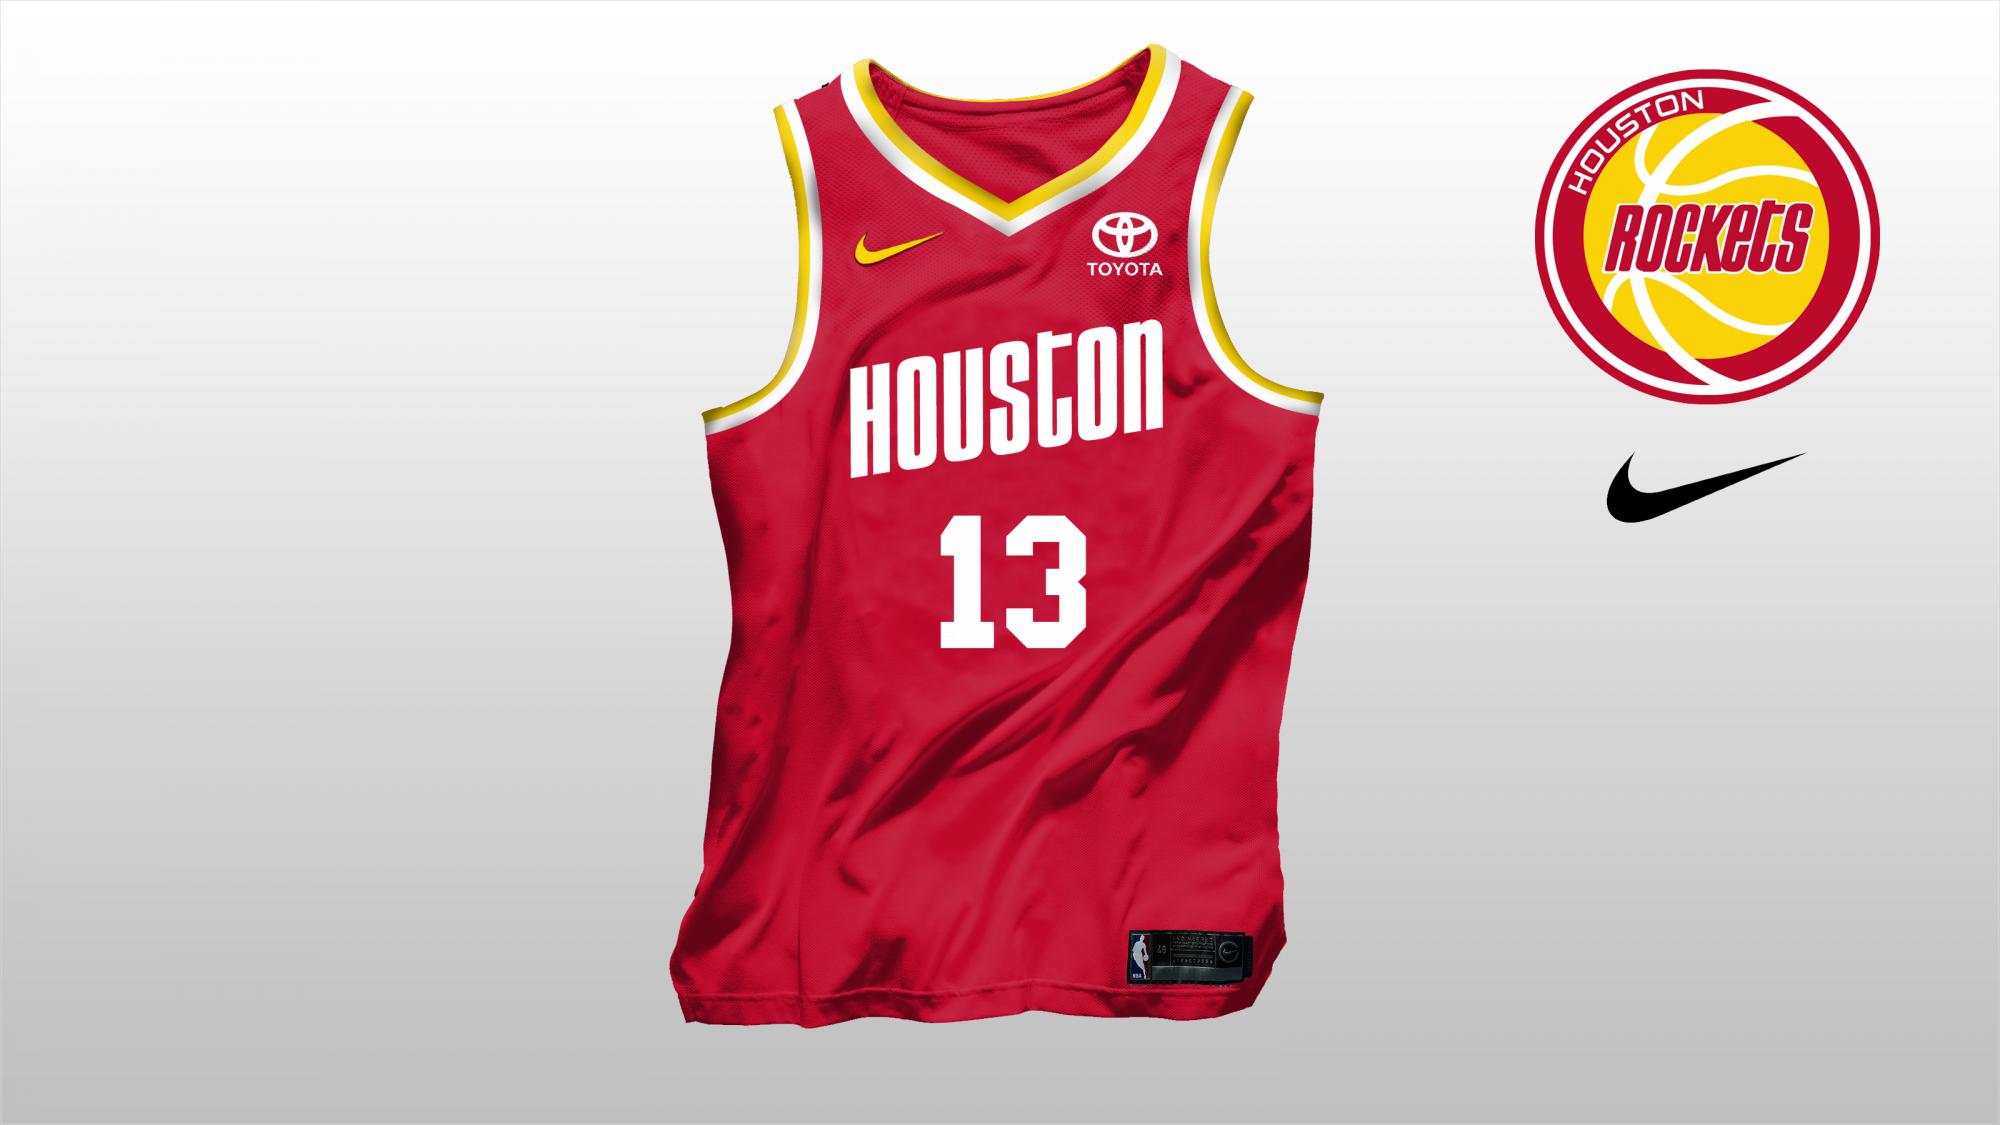 b39026c84b8 Houston Rockets Bring back the glory. - Concepts - Chris Creamer's ...